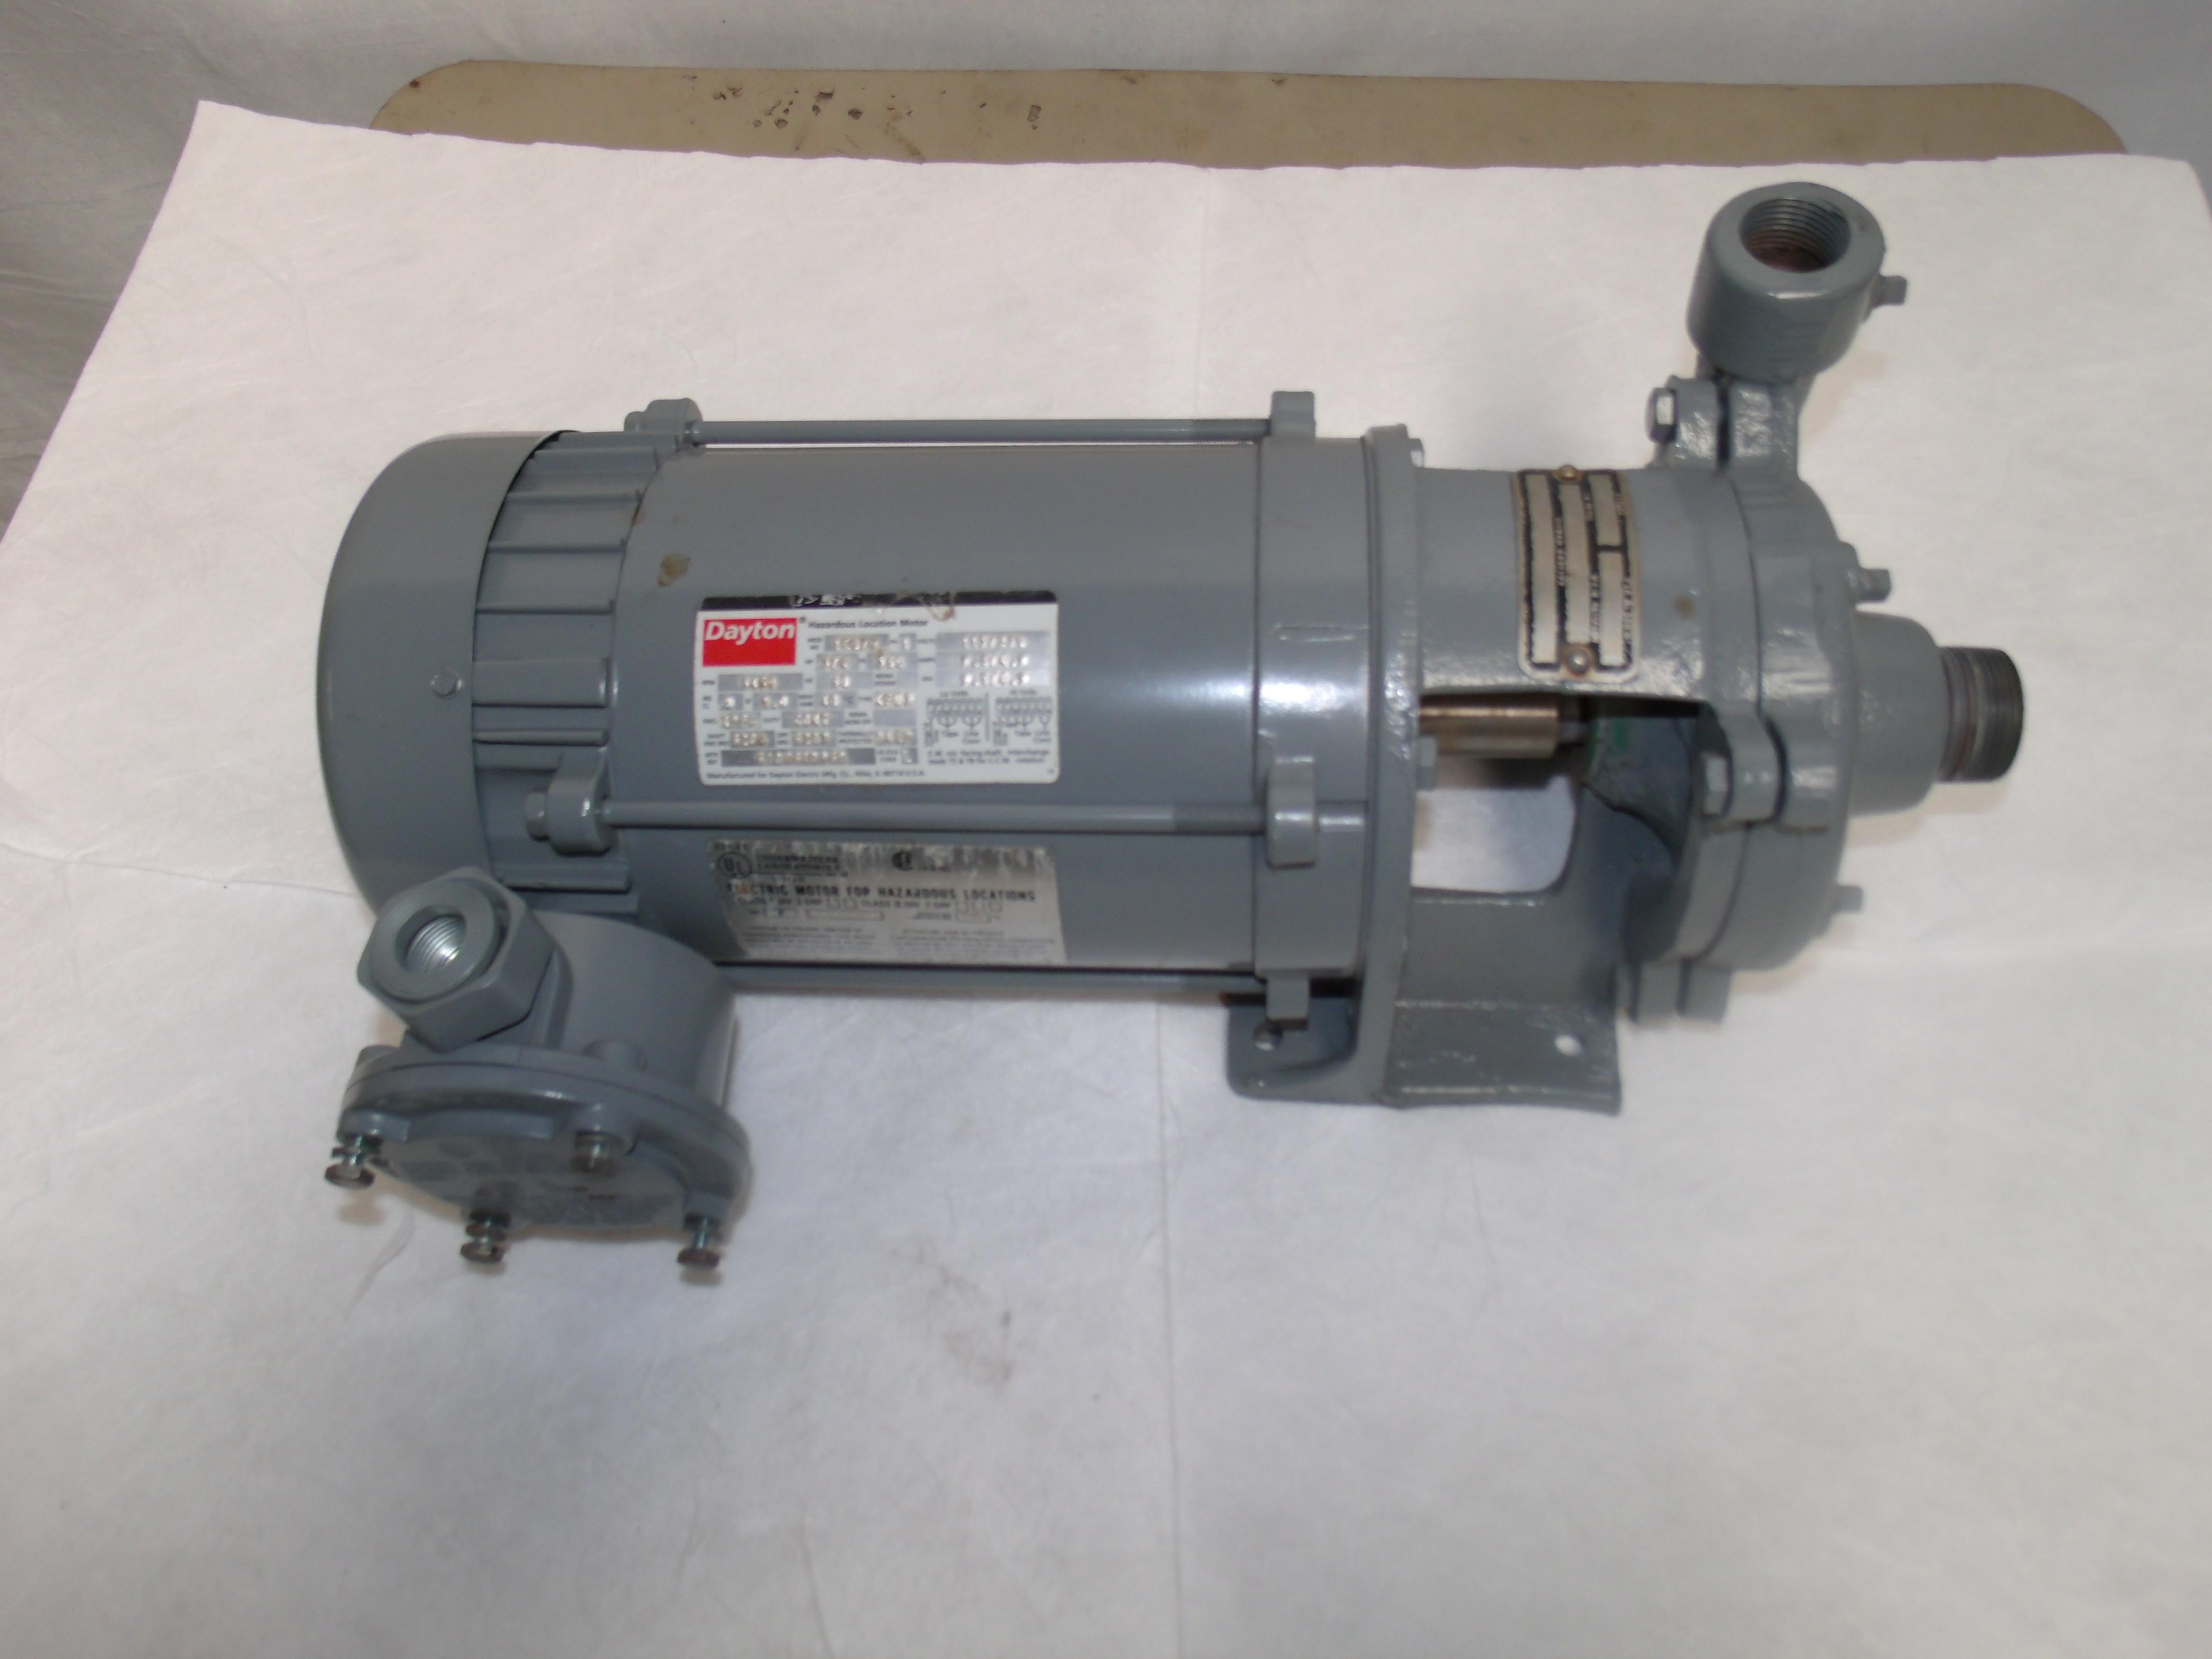 X005 centrifugal water pump dayton 3 4 hp motor for 5 hp motor amps